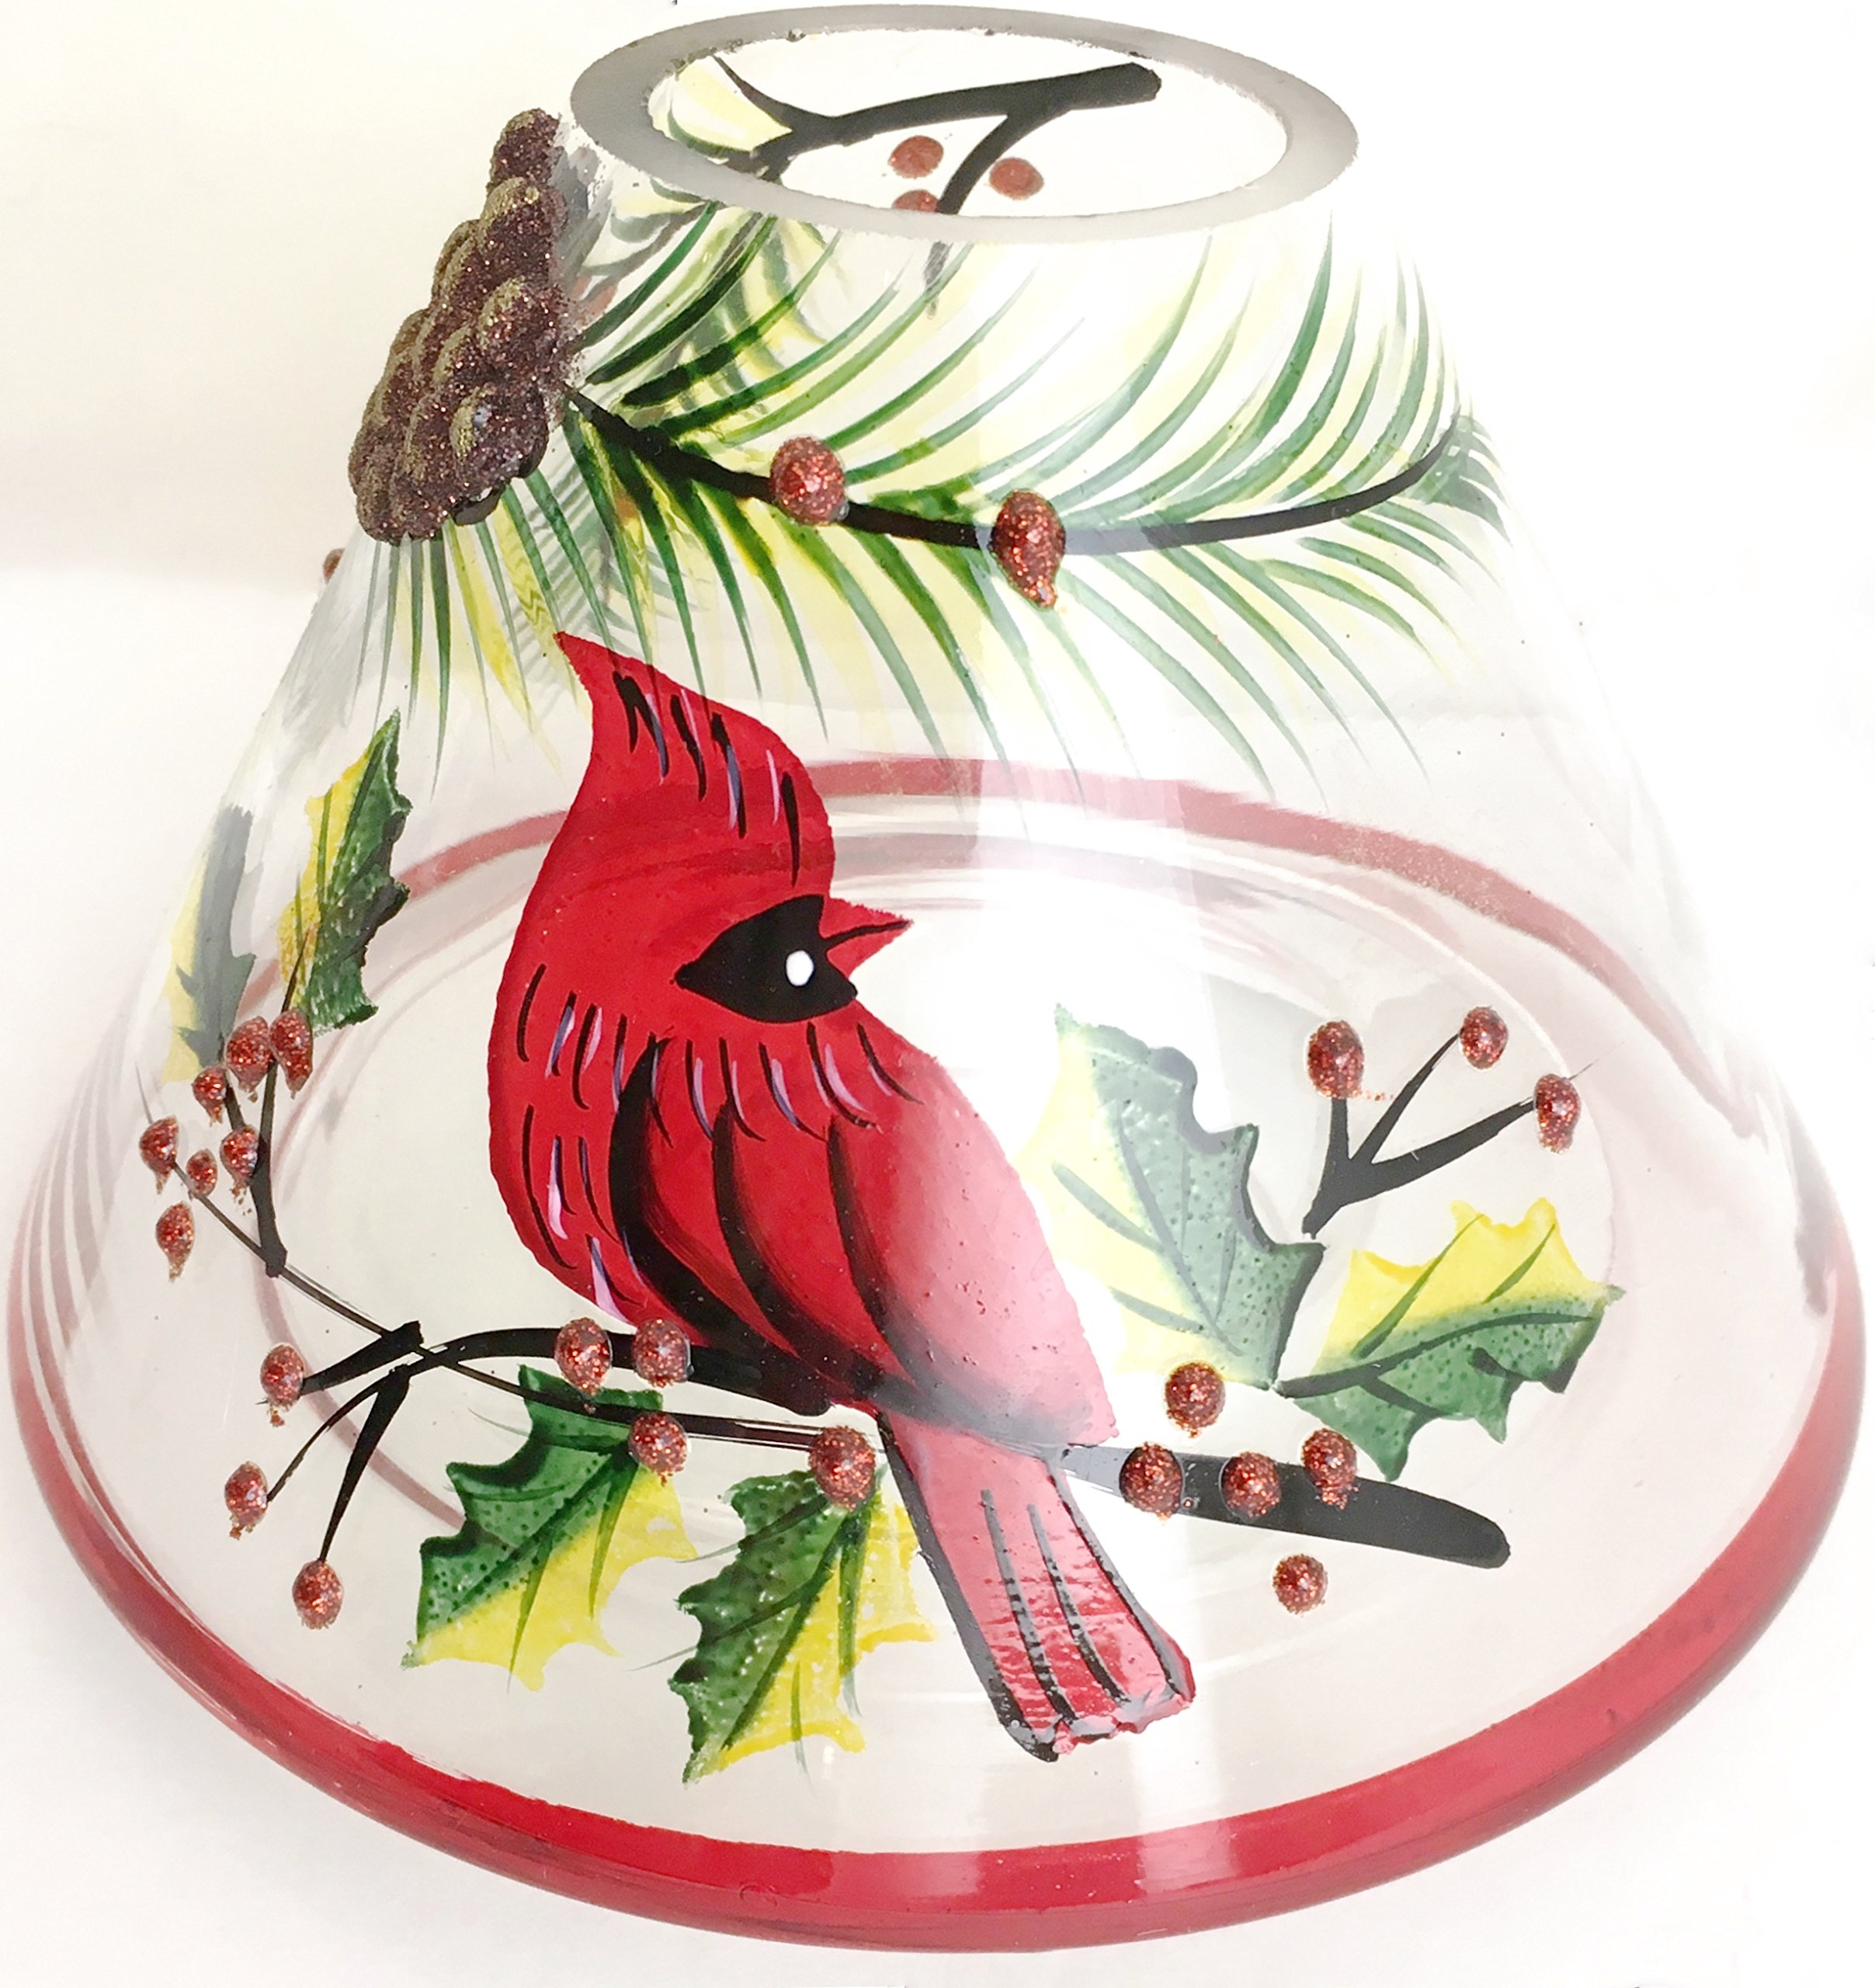 Biedermann & Sons Handpainted Jar Shades, Cardinal Scene, 4-Count by Biedermann & Sons (Image #2)